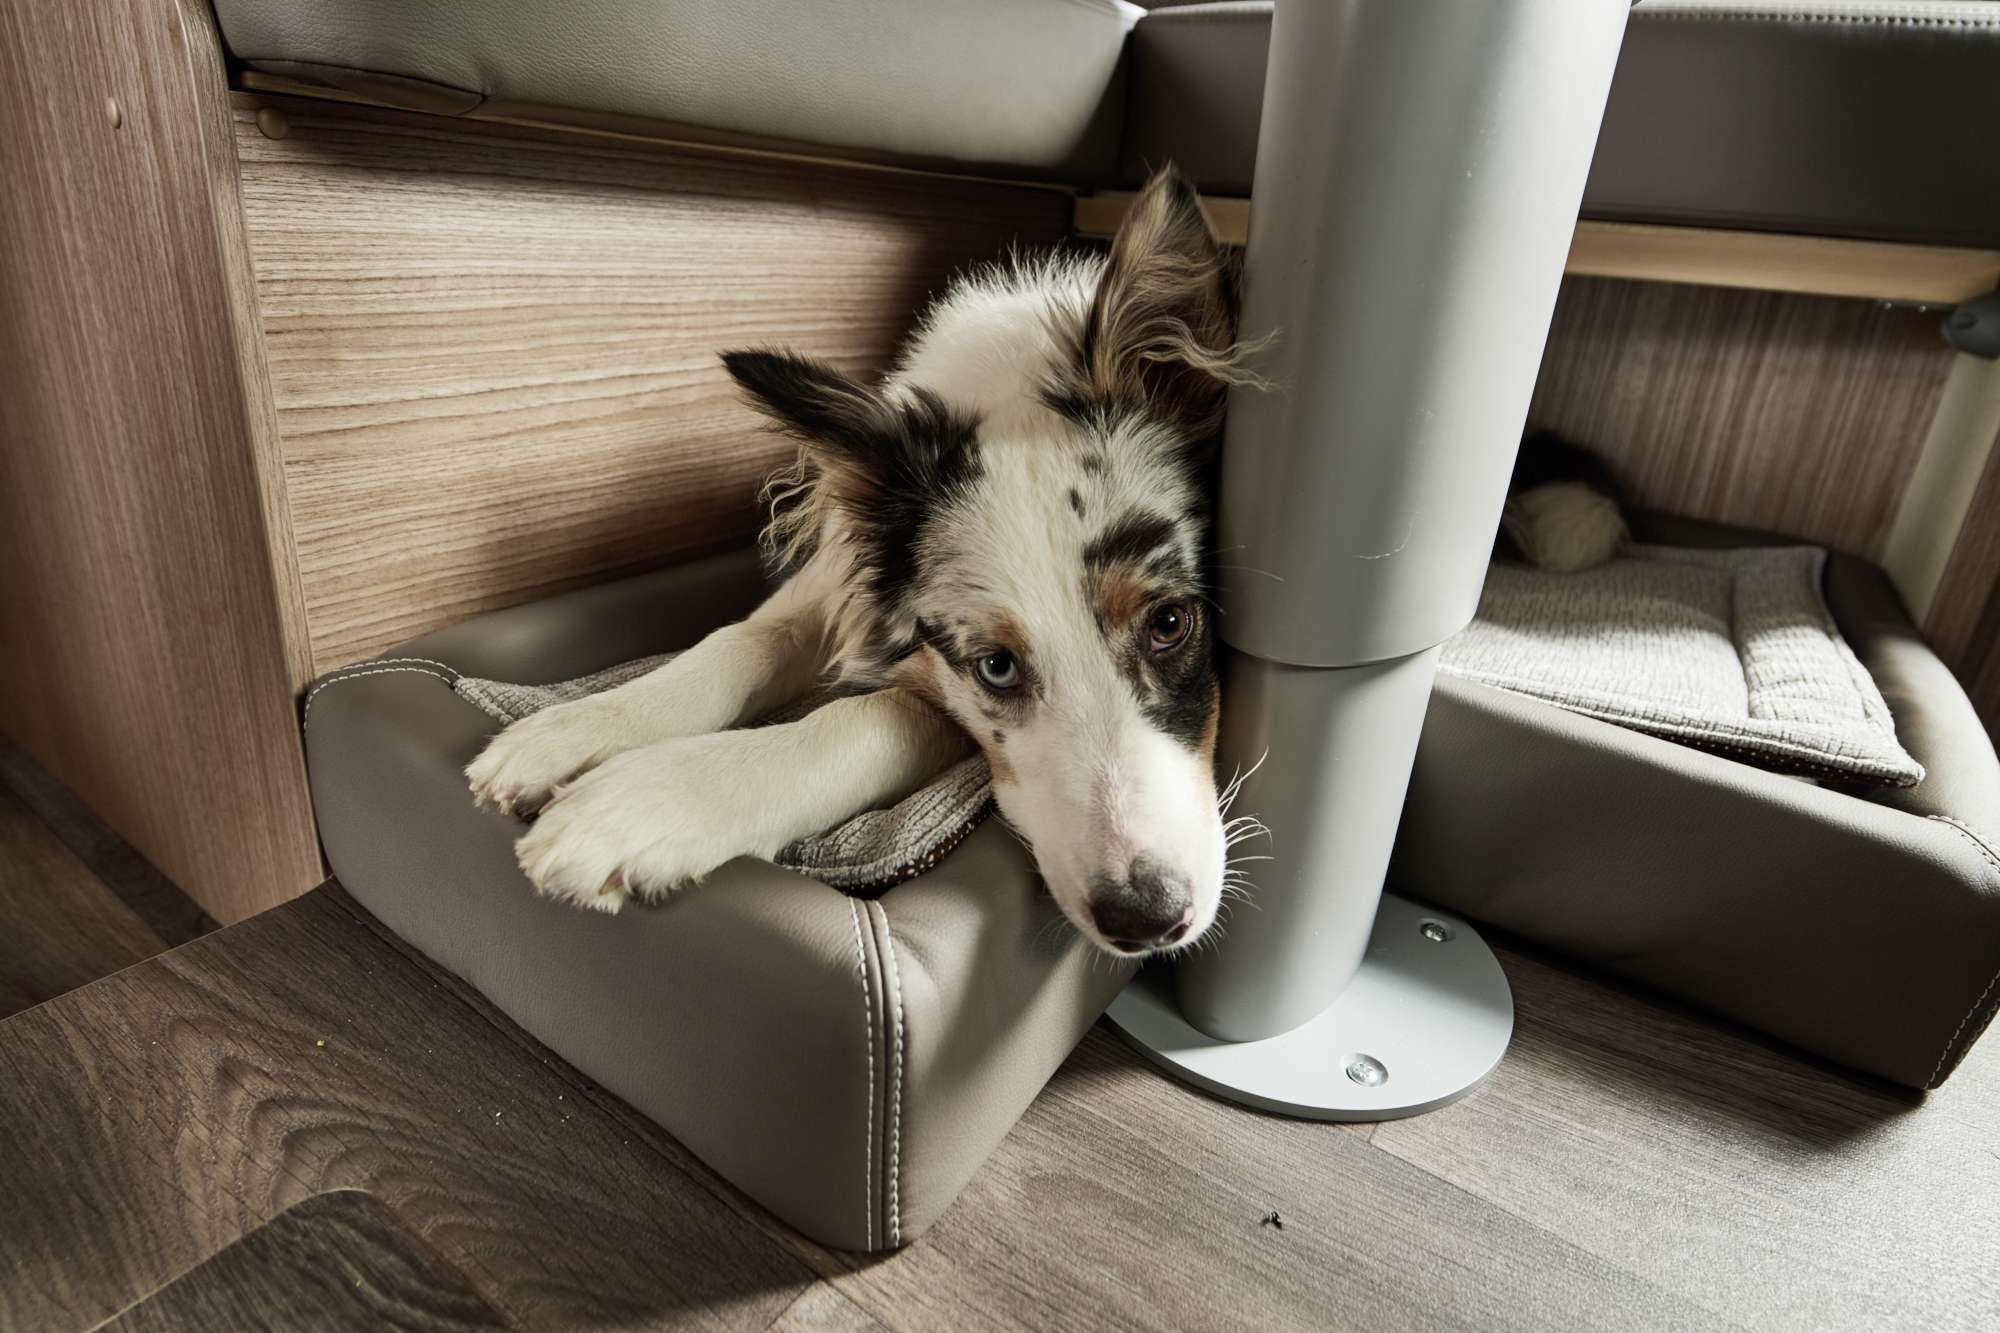 Hundebett   Tiere an Bord   Reise & Transport   Carado GmbH